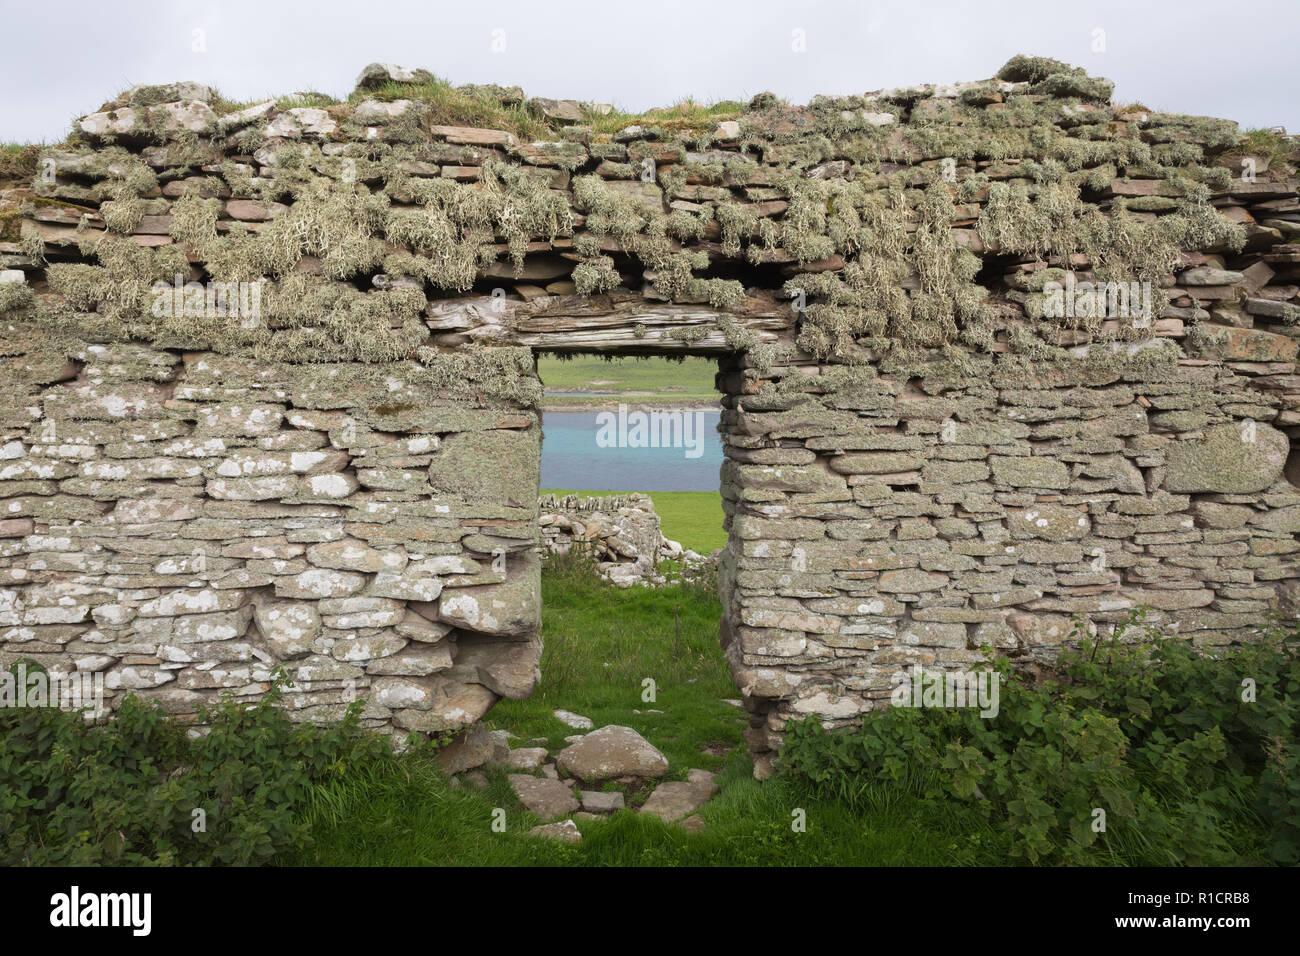 Ruined farmhouse on Bressay, Shetland Isles, UK - Stock Image